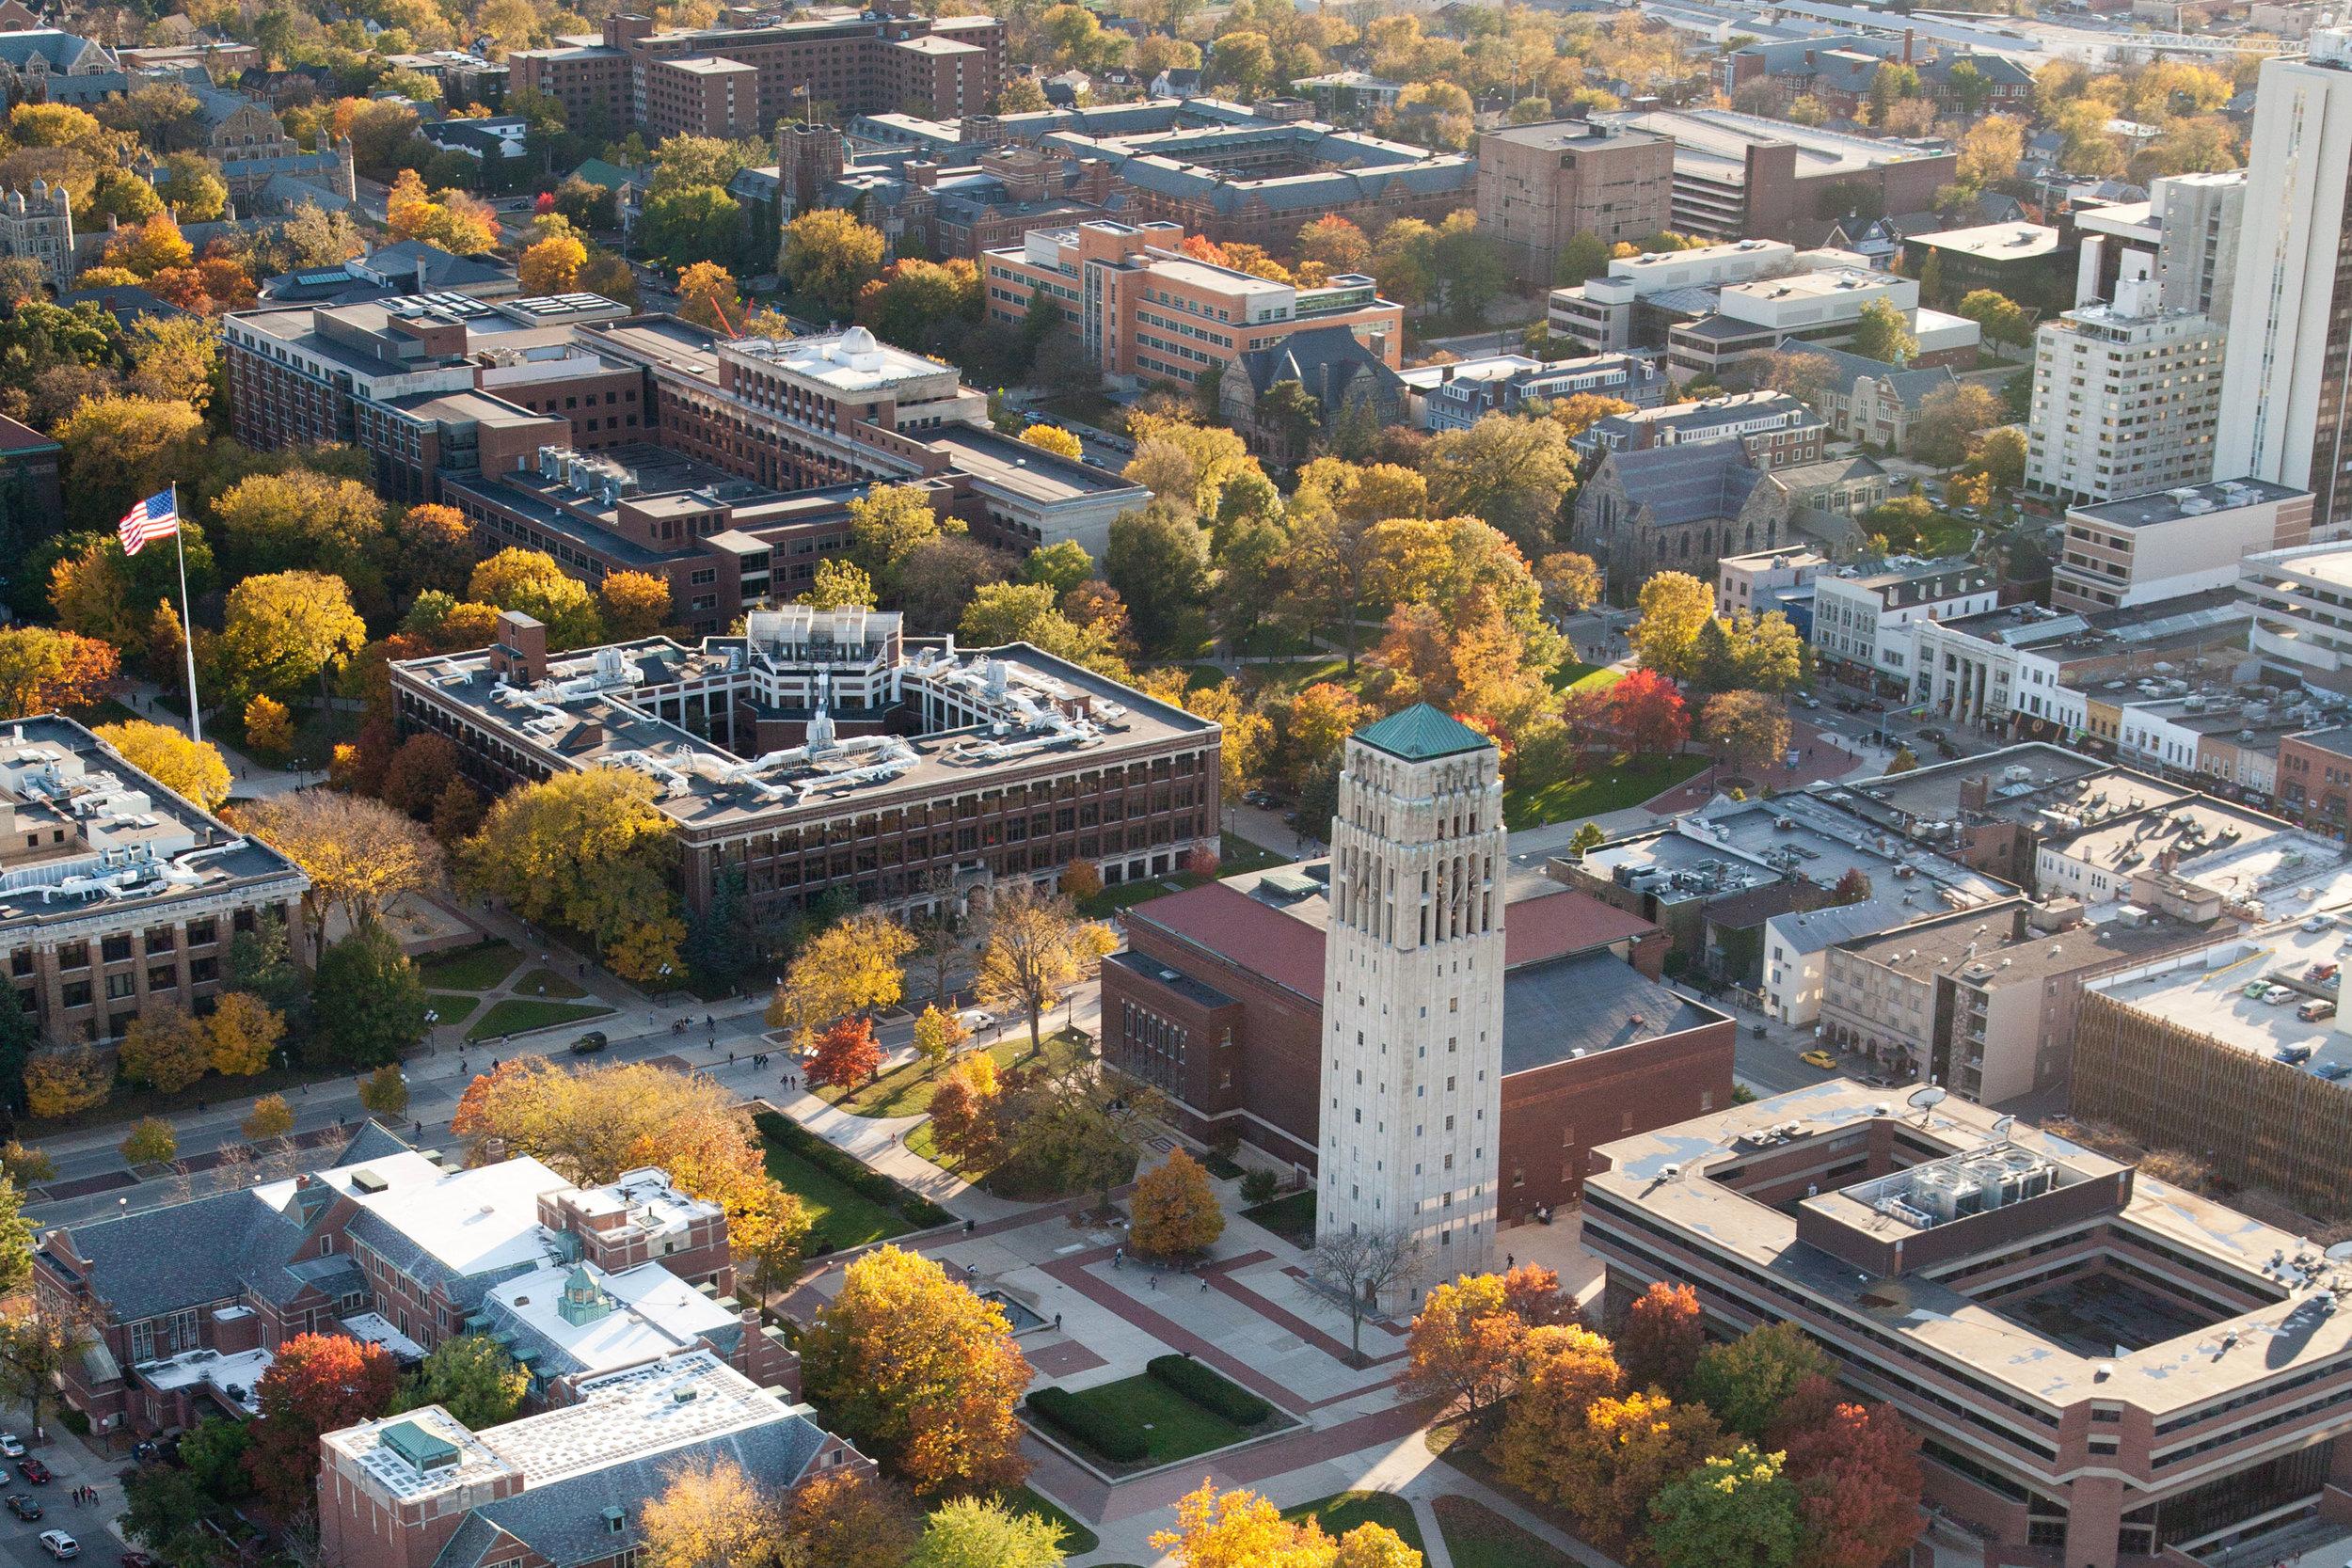 University of michigan supplement essay help